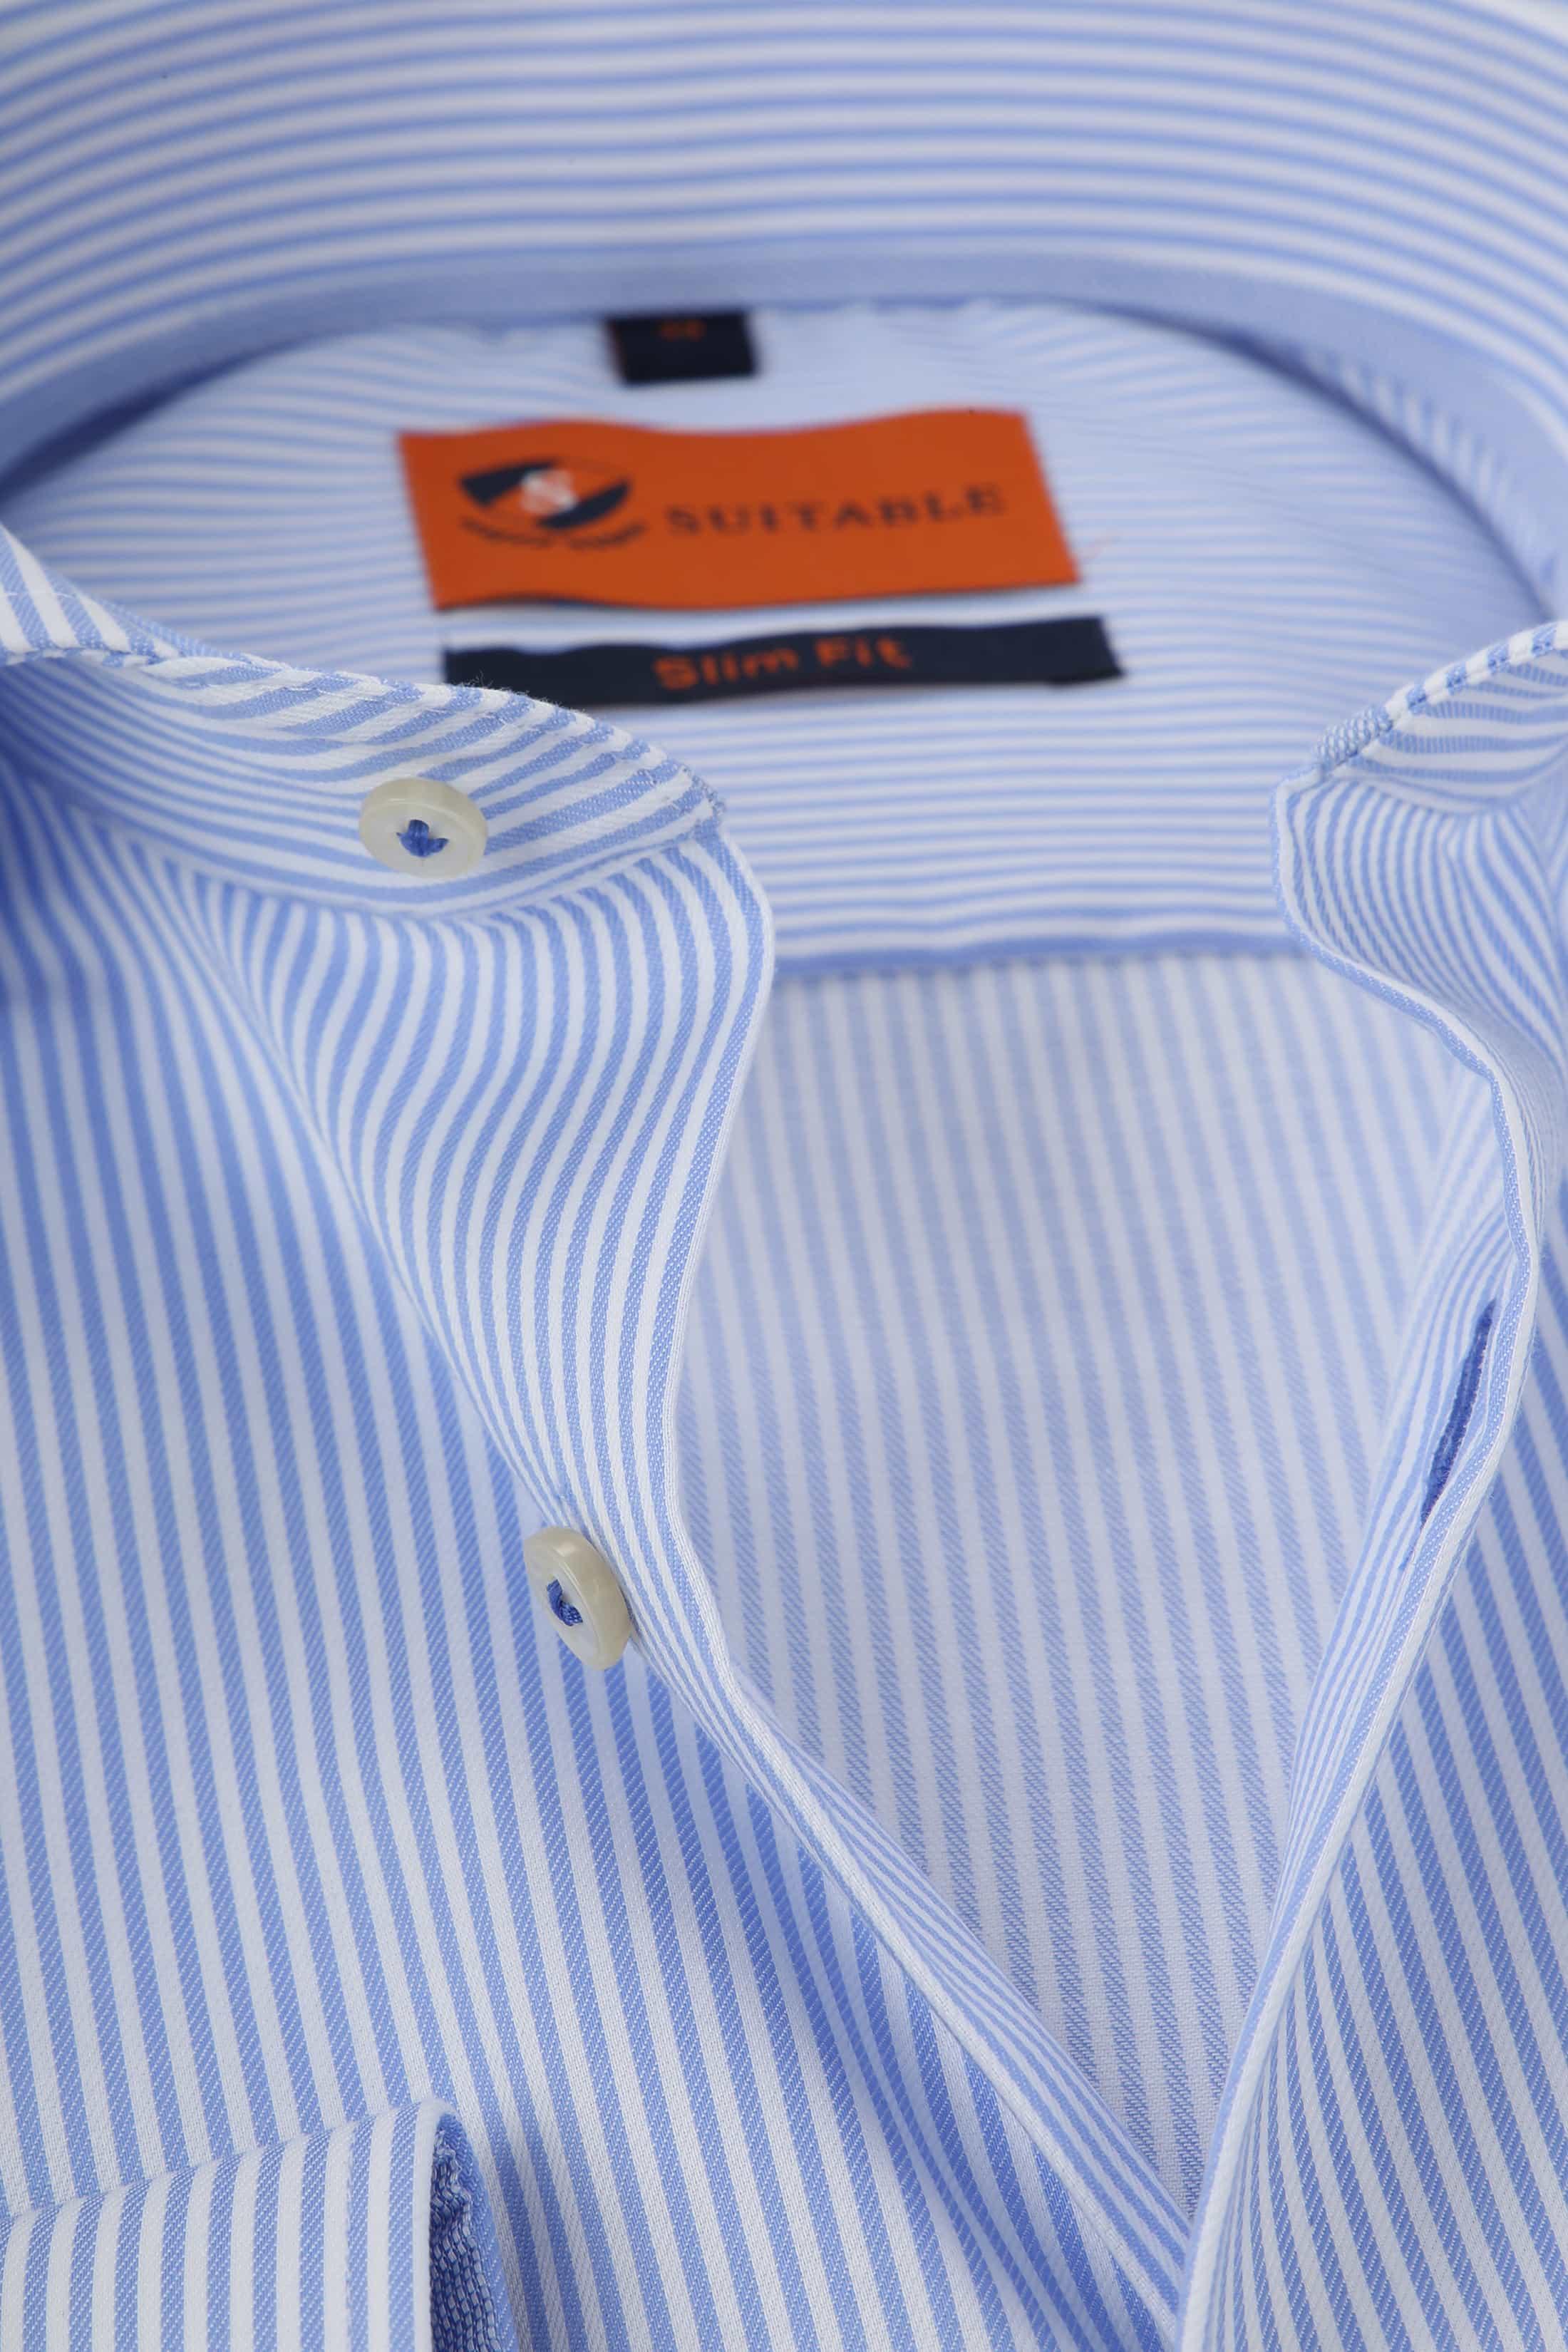 Suitable Hemd Streifen Blau foto 1